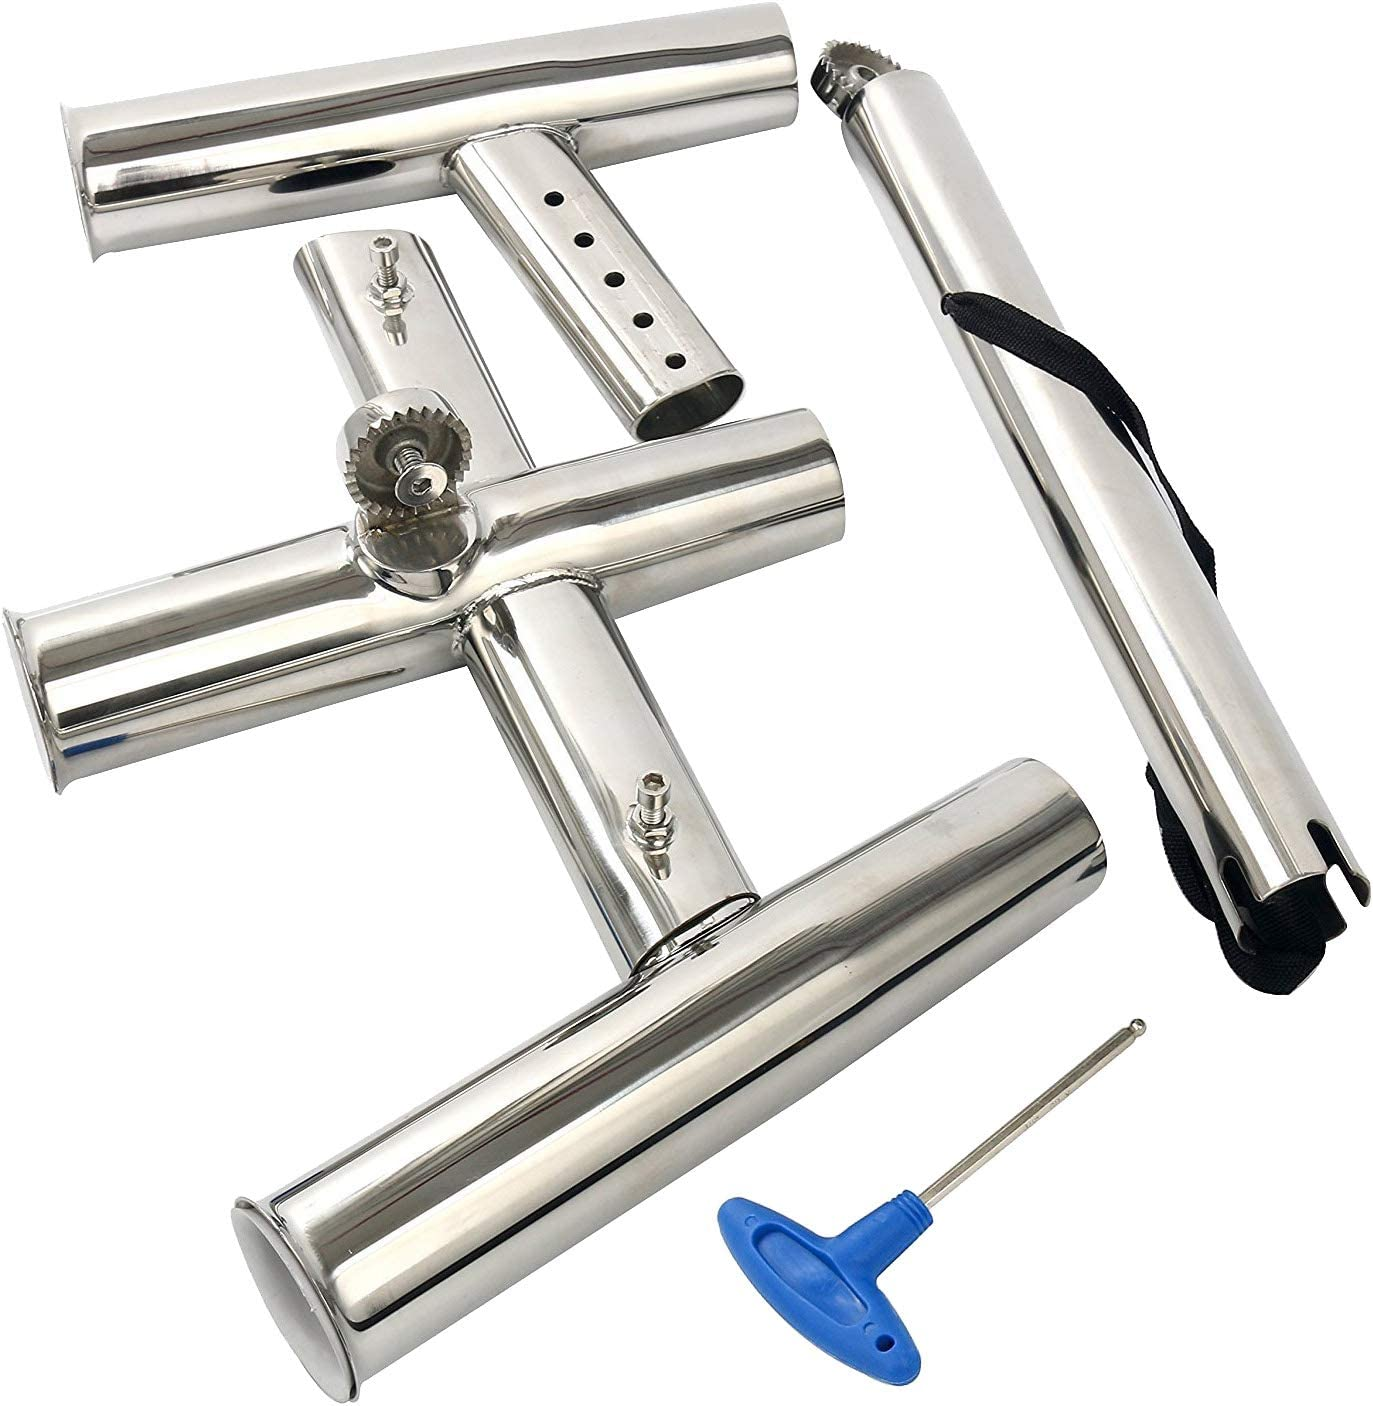 Triple Rod Holder 3 Tubes Stainless Steel Trident Outrigger Stylish Rod Holder